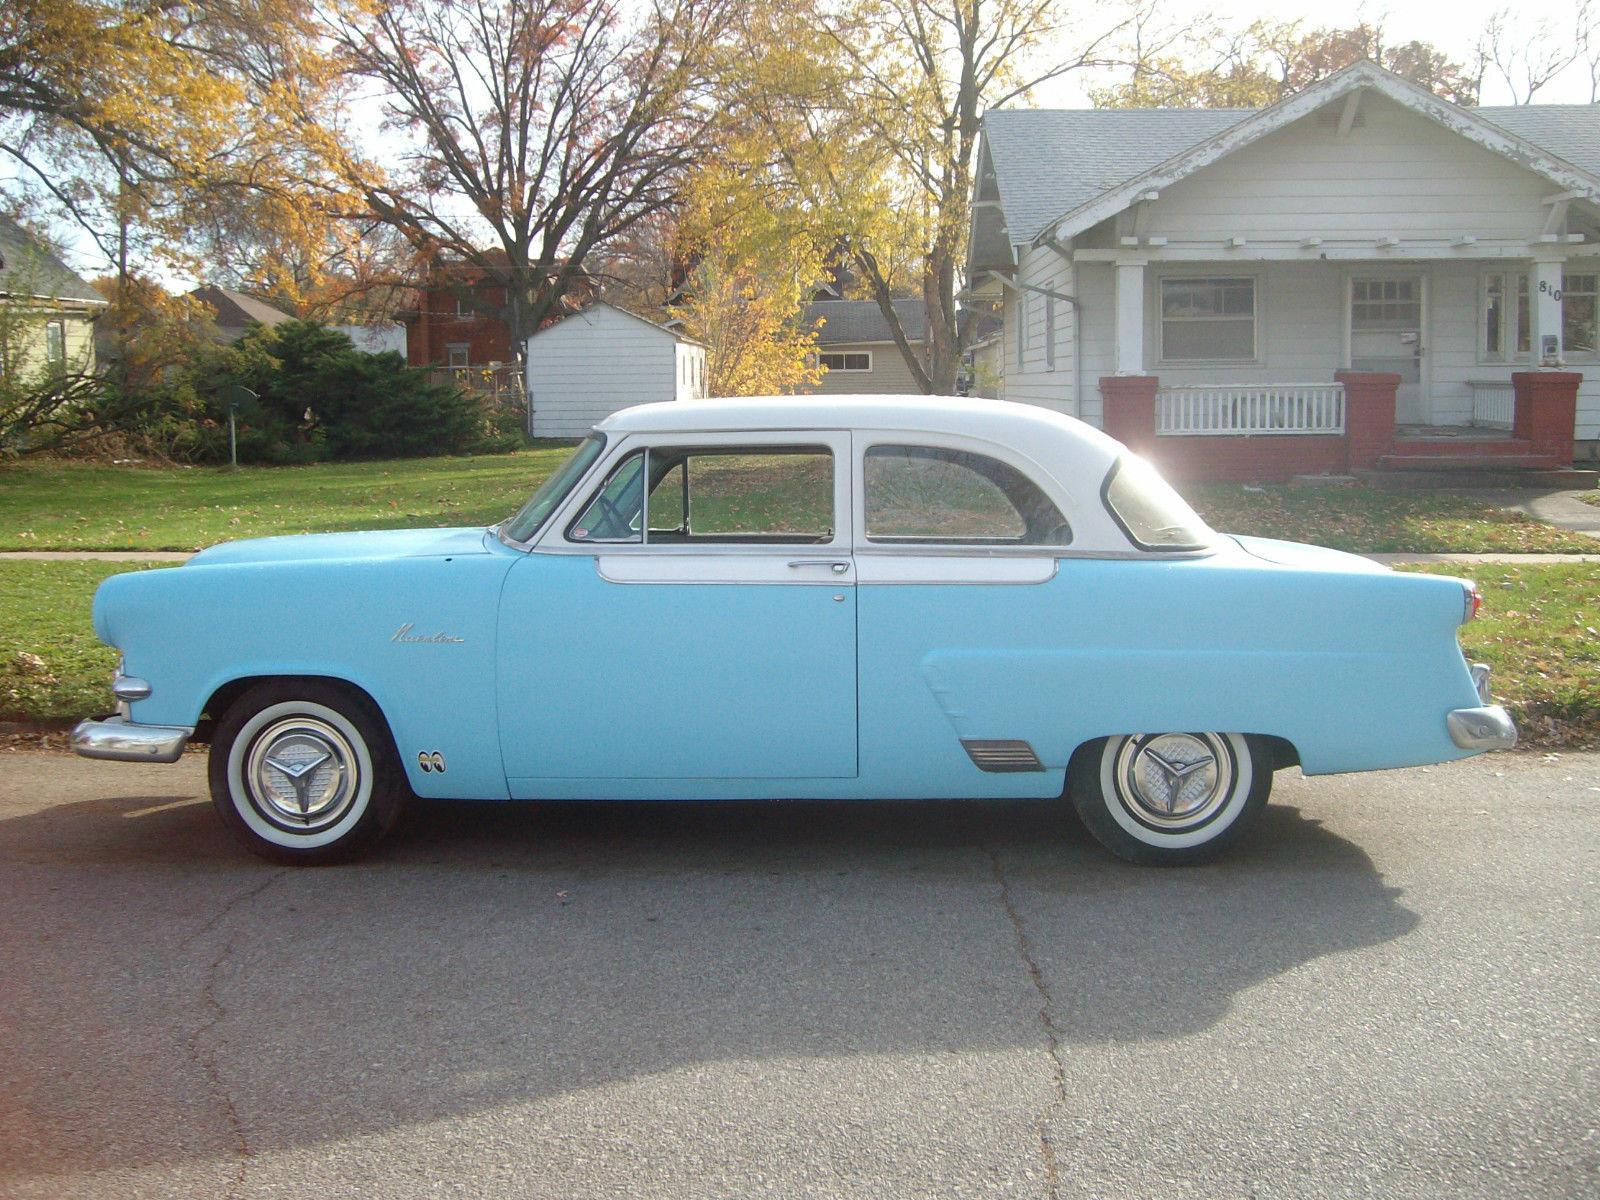 1953 53 ford mainline custom hot rod 2 door sedan cruiser for 1953 ford 2 door sedan